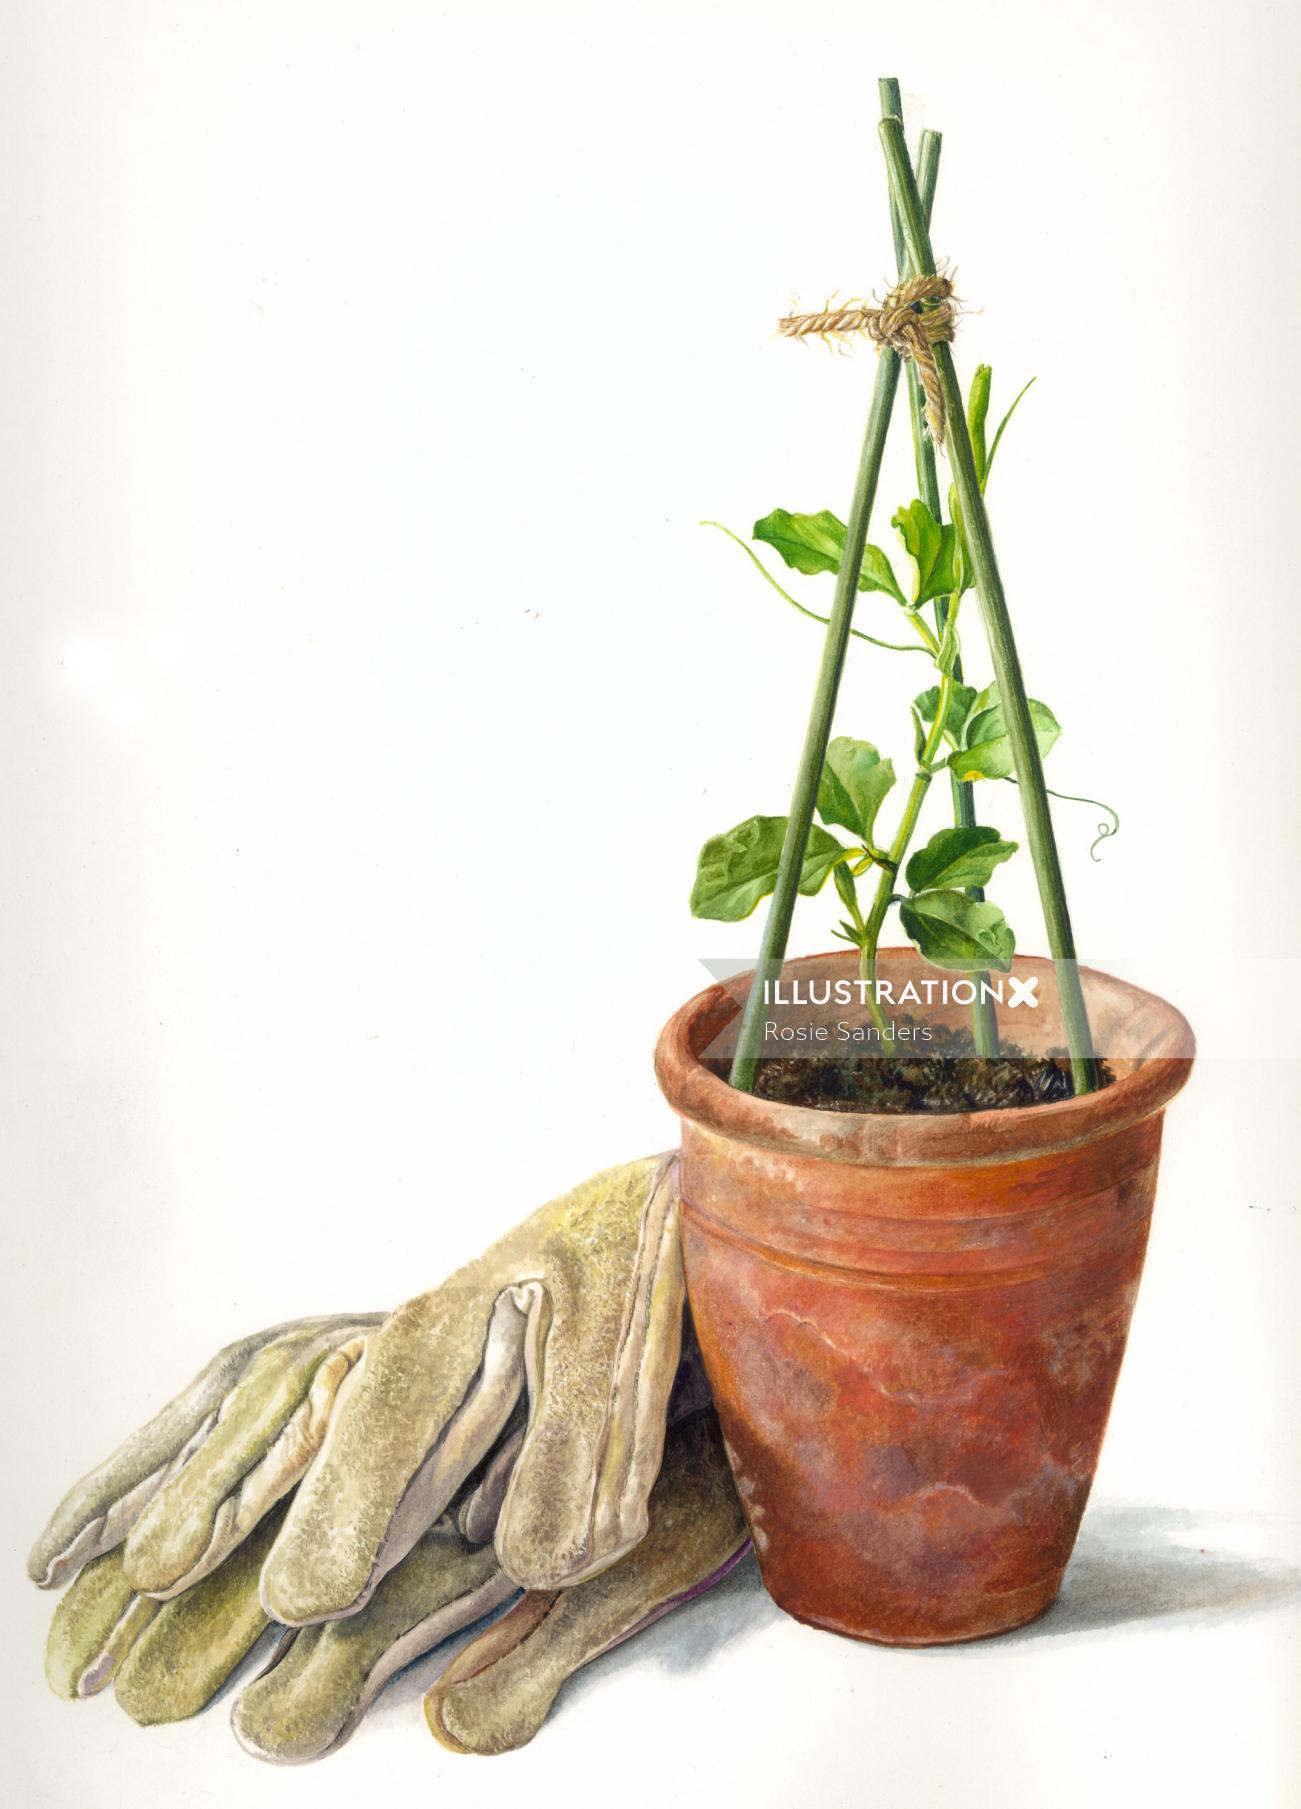 Flower pot illustration by Rosie Sanders